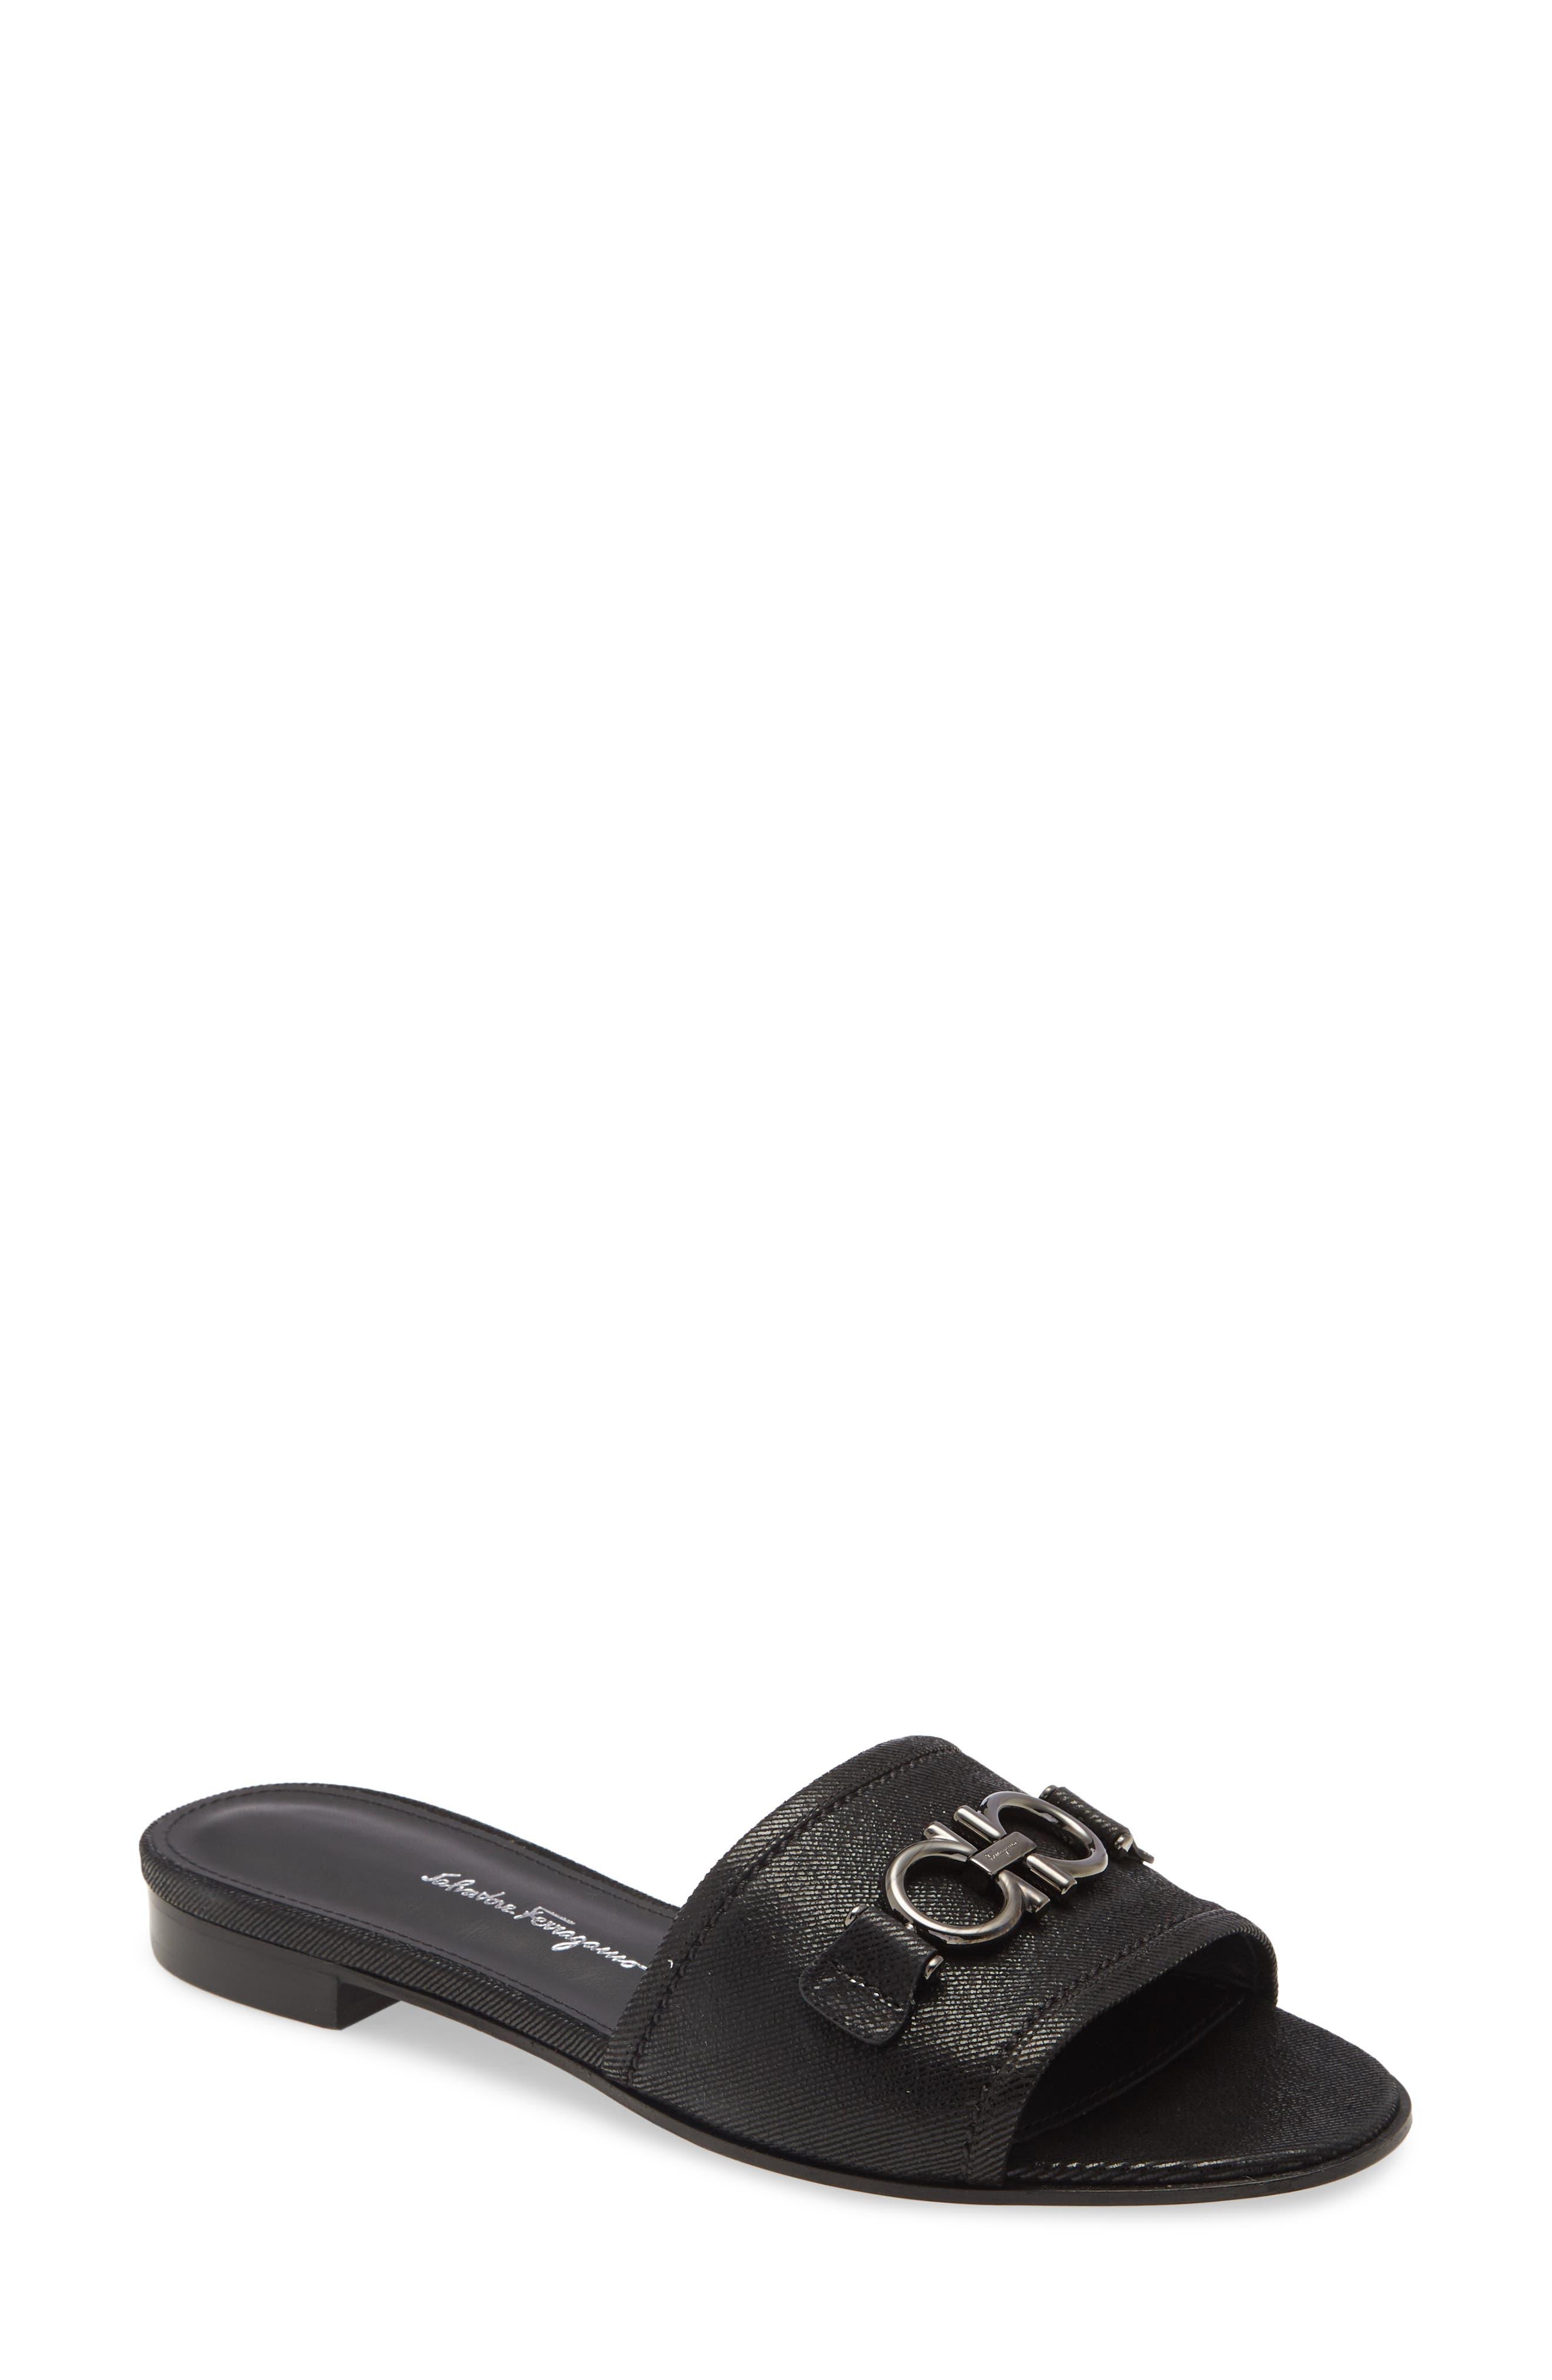 Salvatore Ferragamo Shoes | Nordstrom